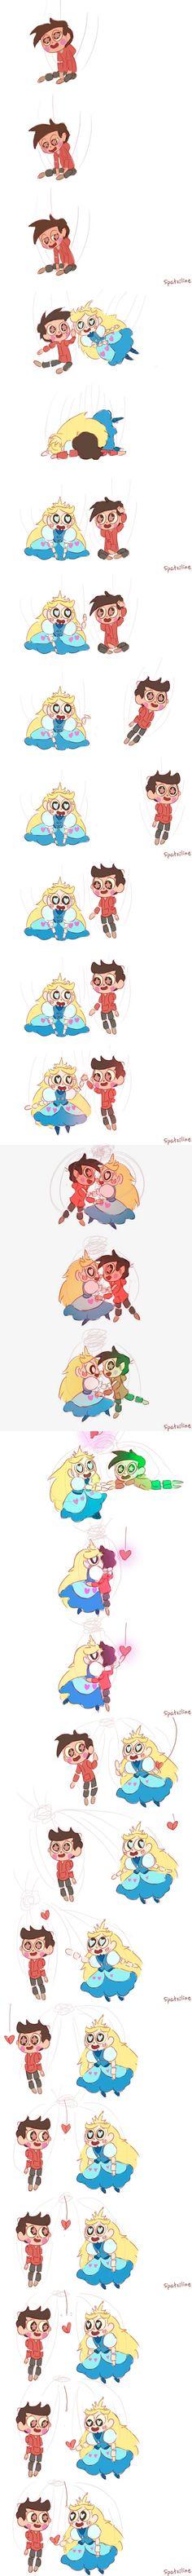 Star and Marco Starco Comic, Disney Stars, Star Vs The Forces Of Evil, Force Of Evil, Disney Channel, Gravity Falls, Fan Art, Comics, Gravity Falls Bill